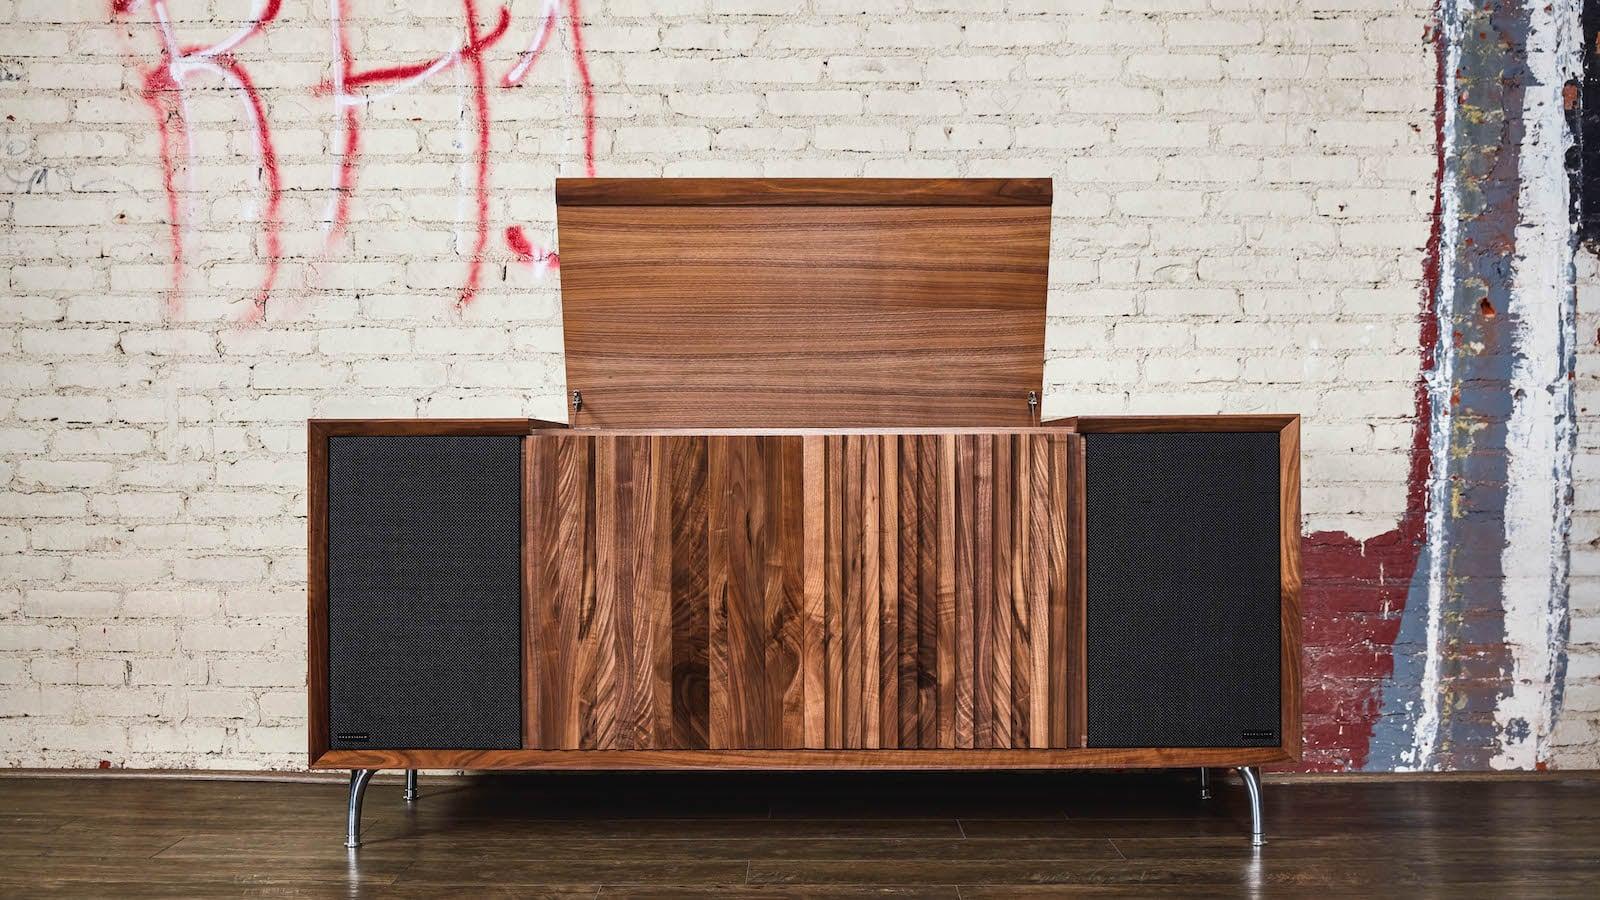 Wrensilva-M1-wooden-record-console-04.jpg